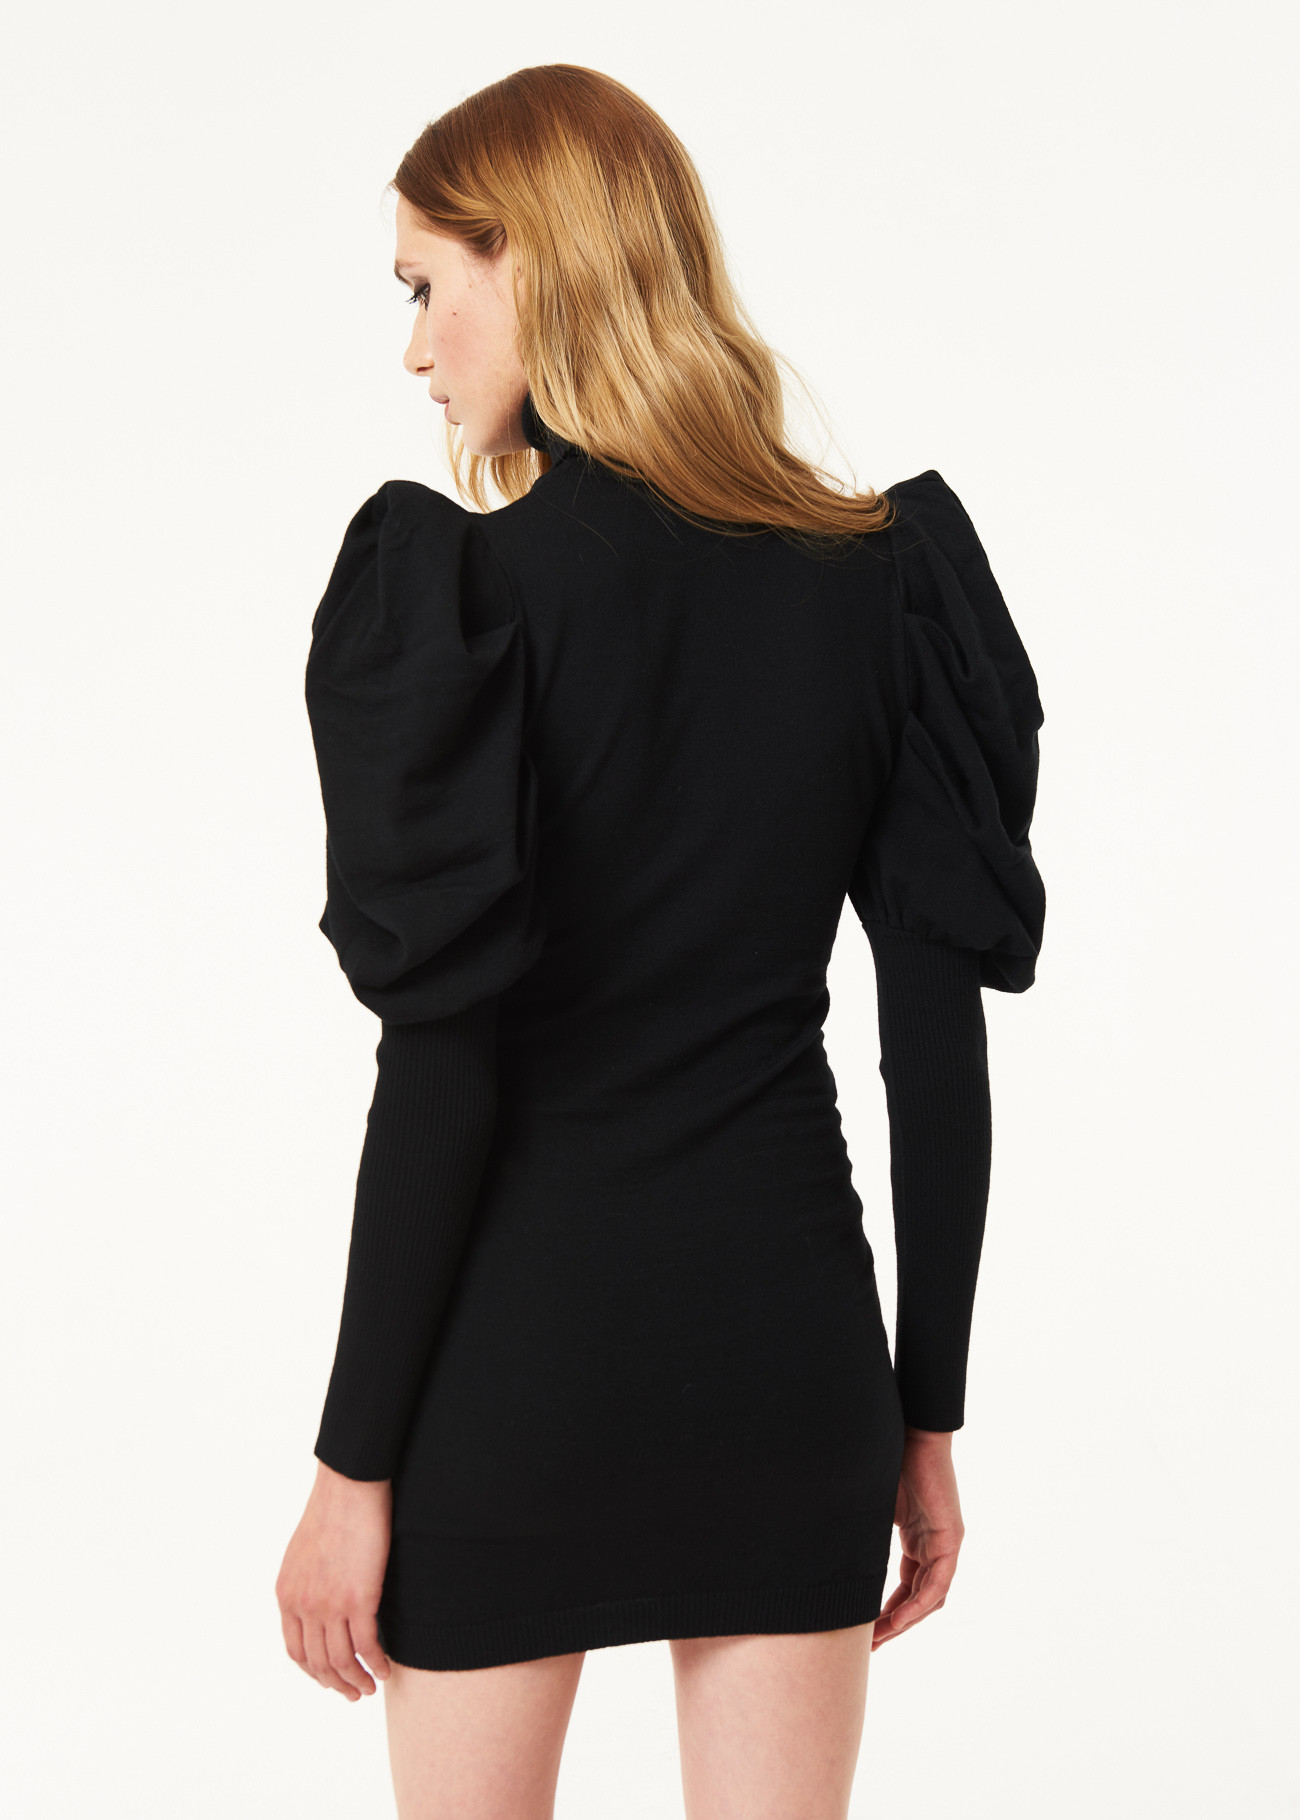 Wool short dress fitted hig collar  DENNY ROSE |  | DD500032001